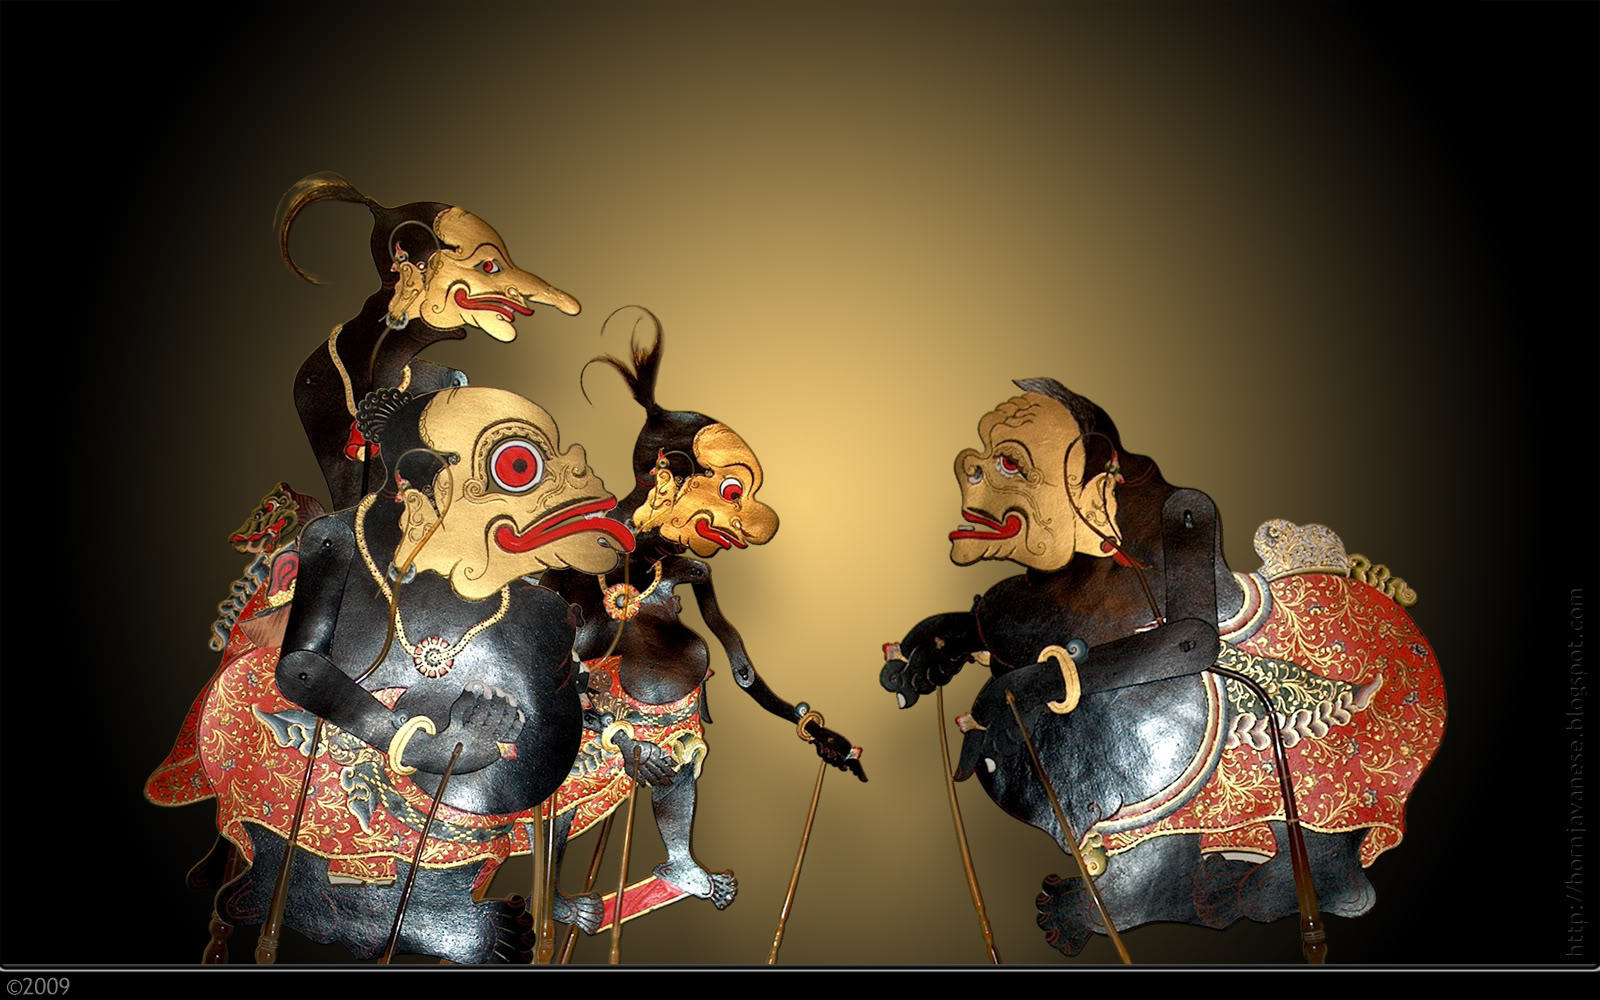 Budaya Ardiyant09